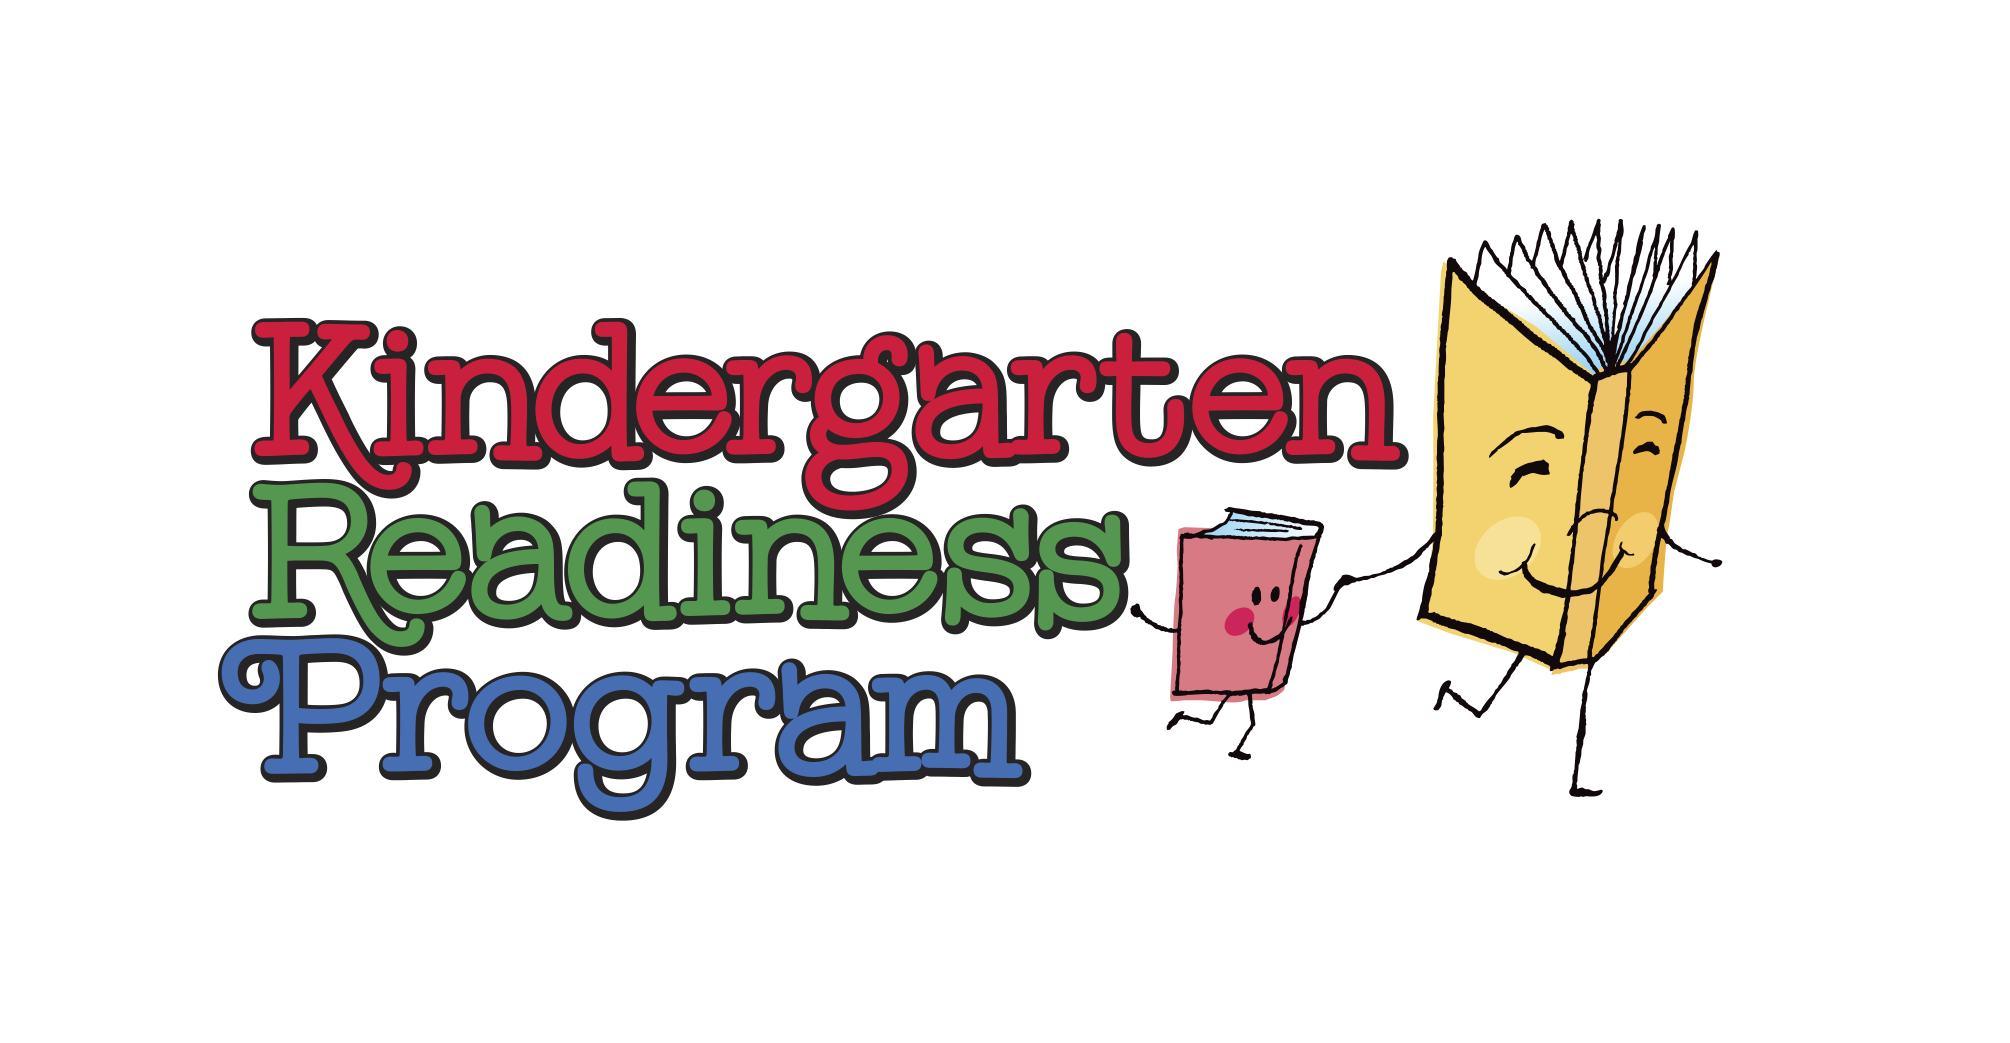 Kindergarten readiness clipart clip art free Kindergarten readiness clipart - ClipartFest clip art free